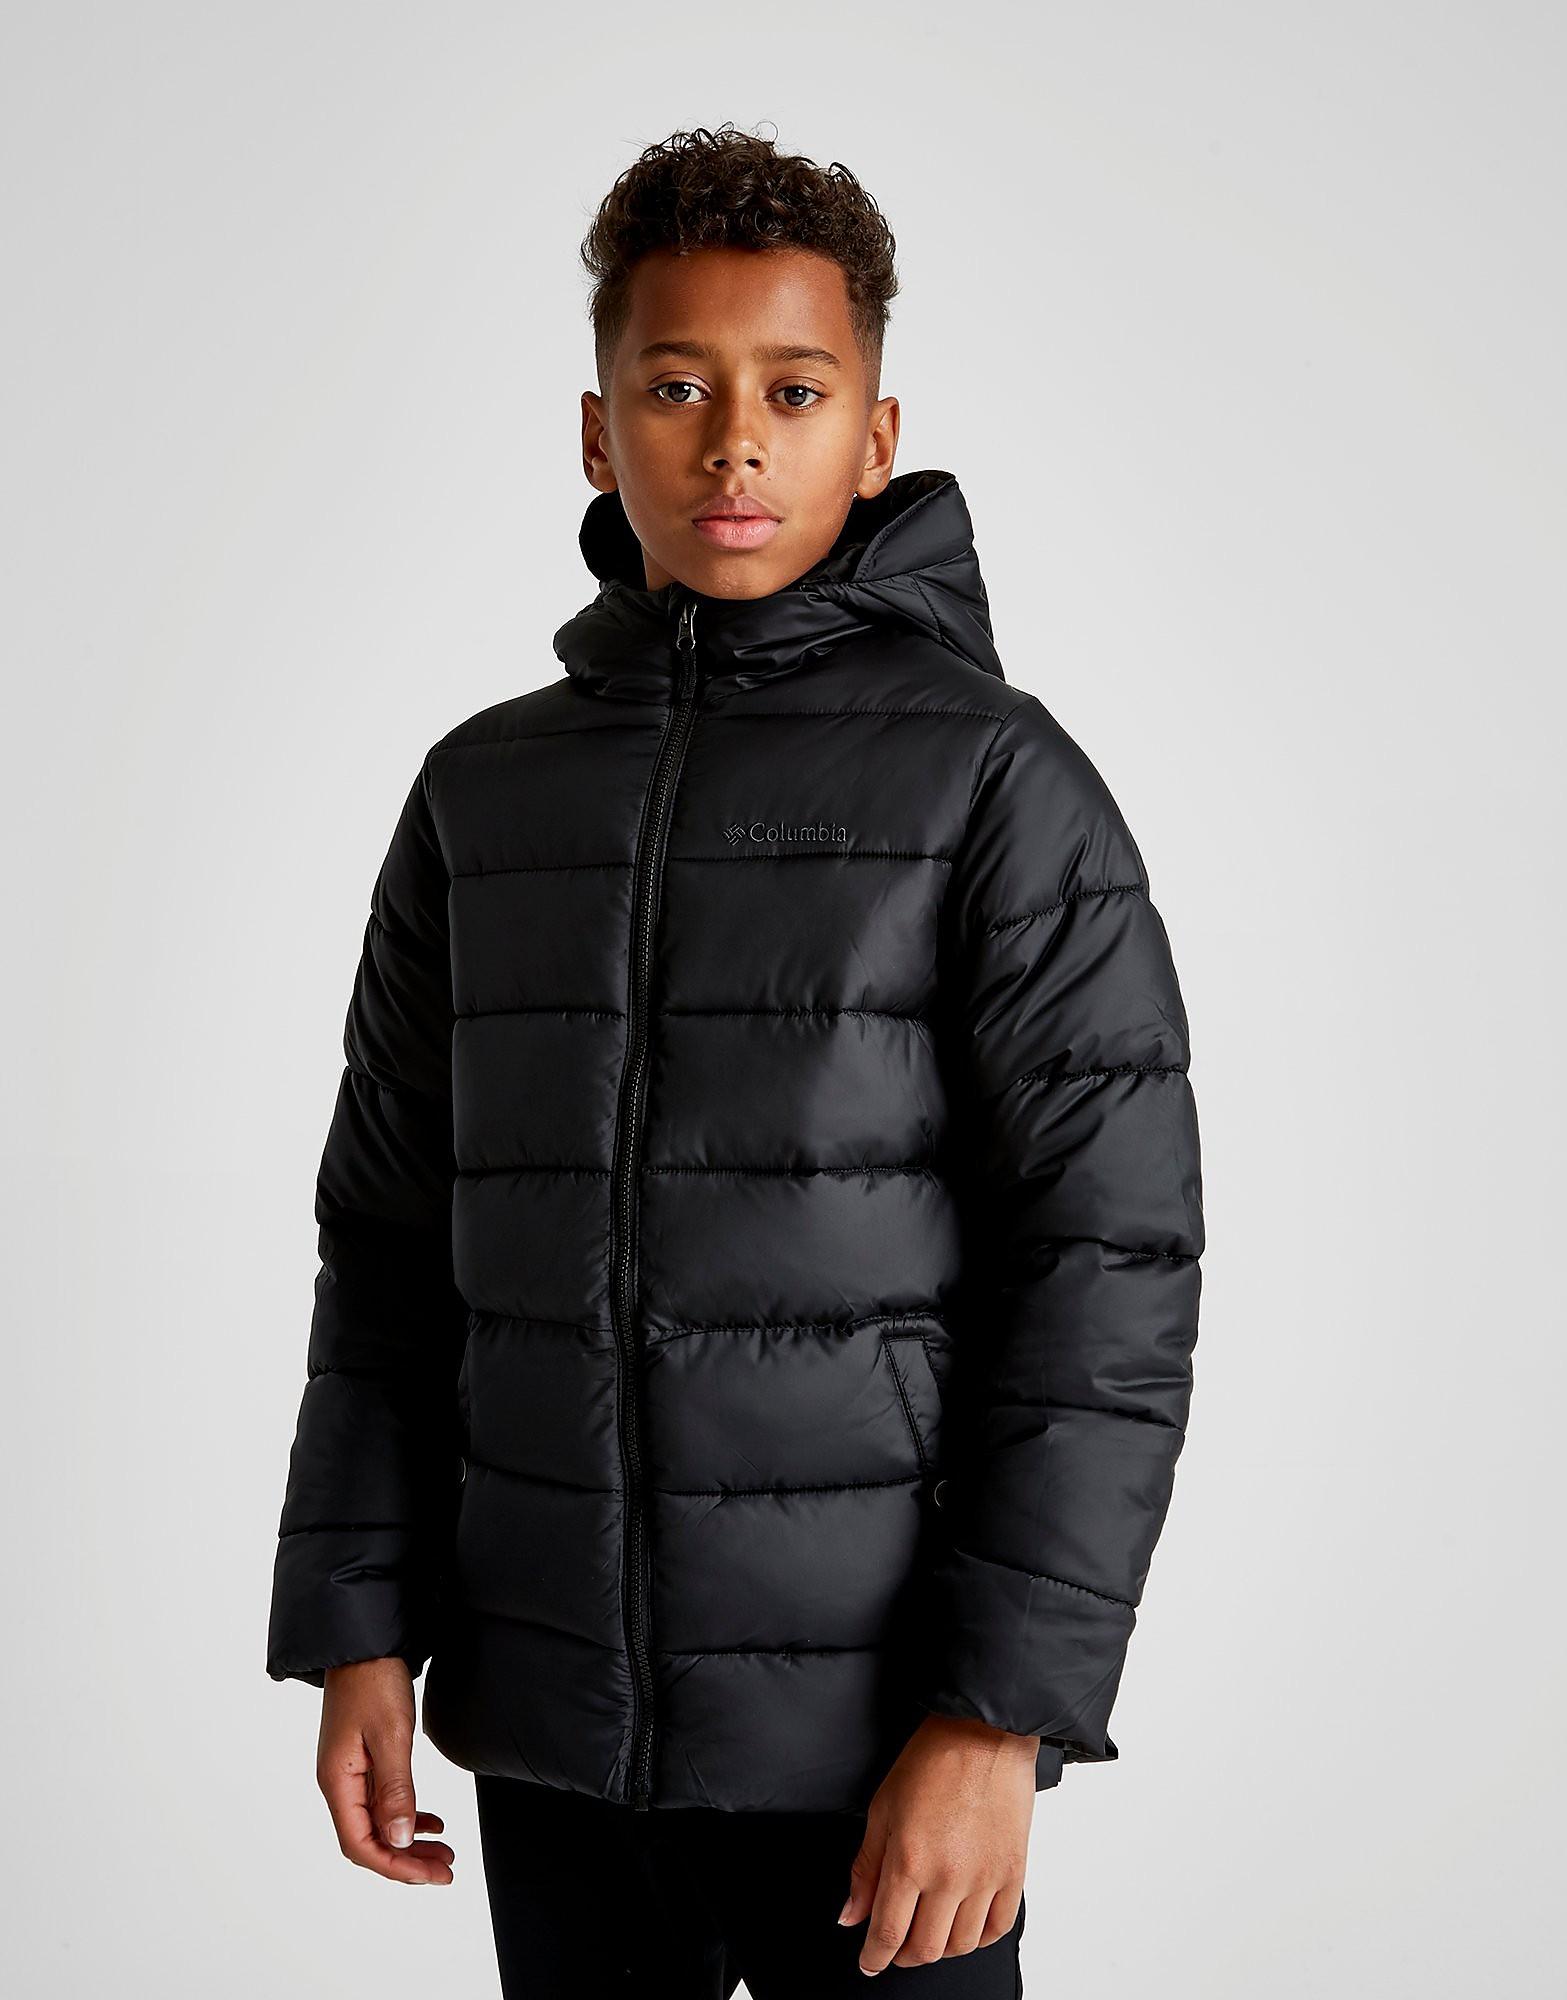 Columbia Puffer Jacket Junior - Zwart - Kind